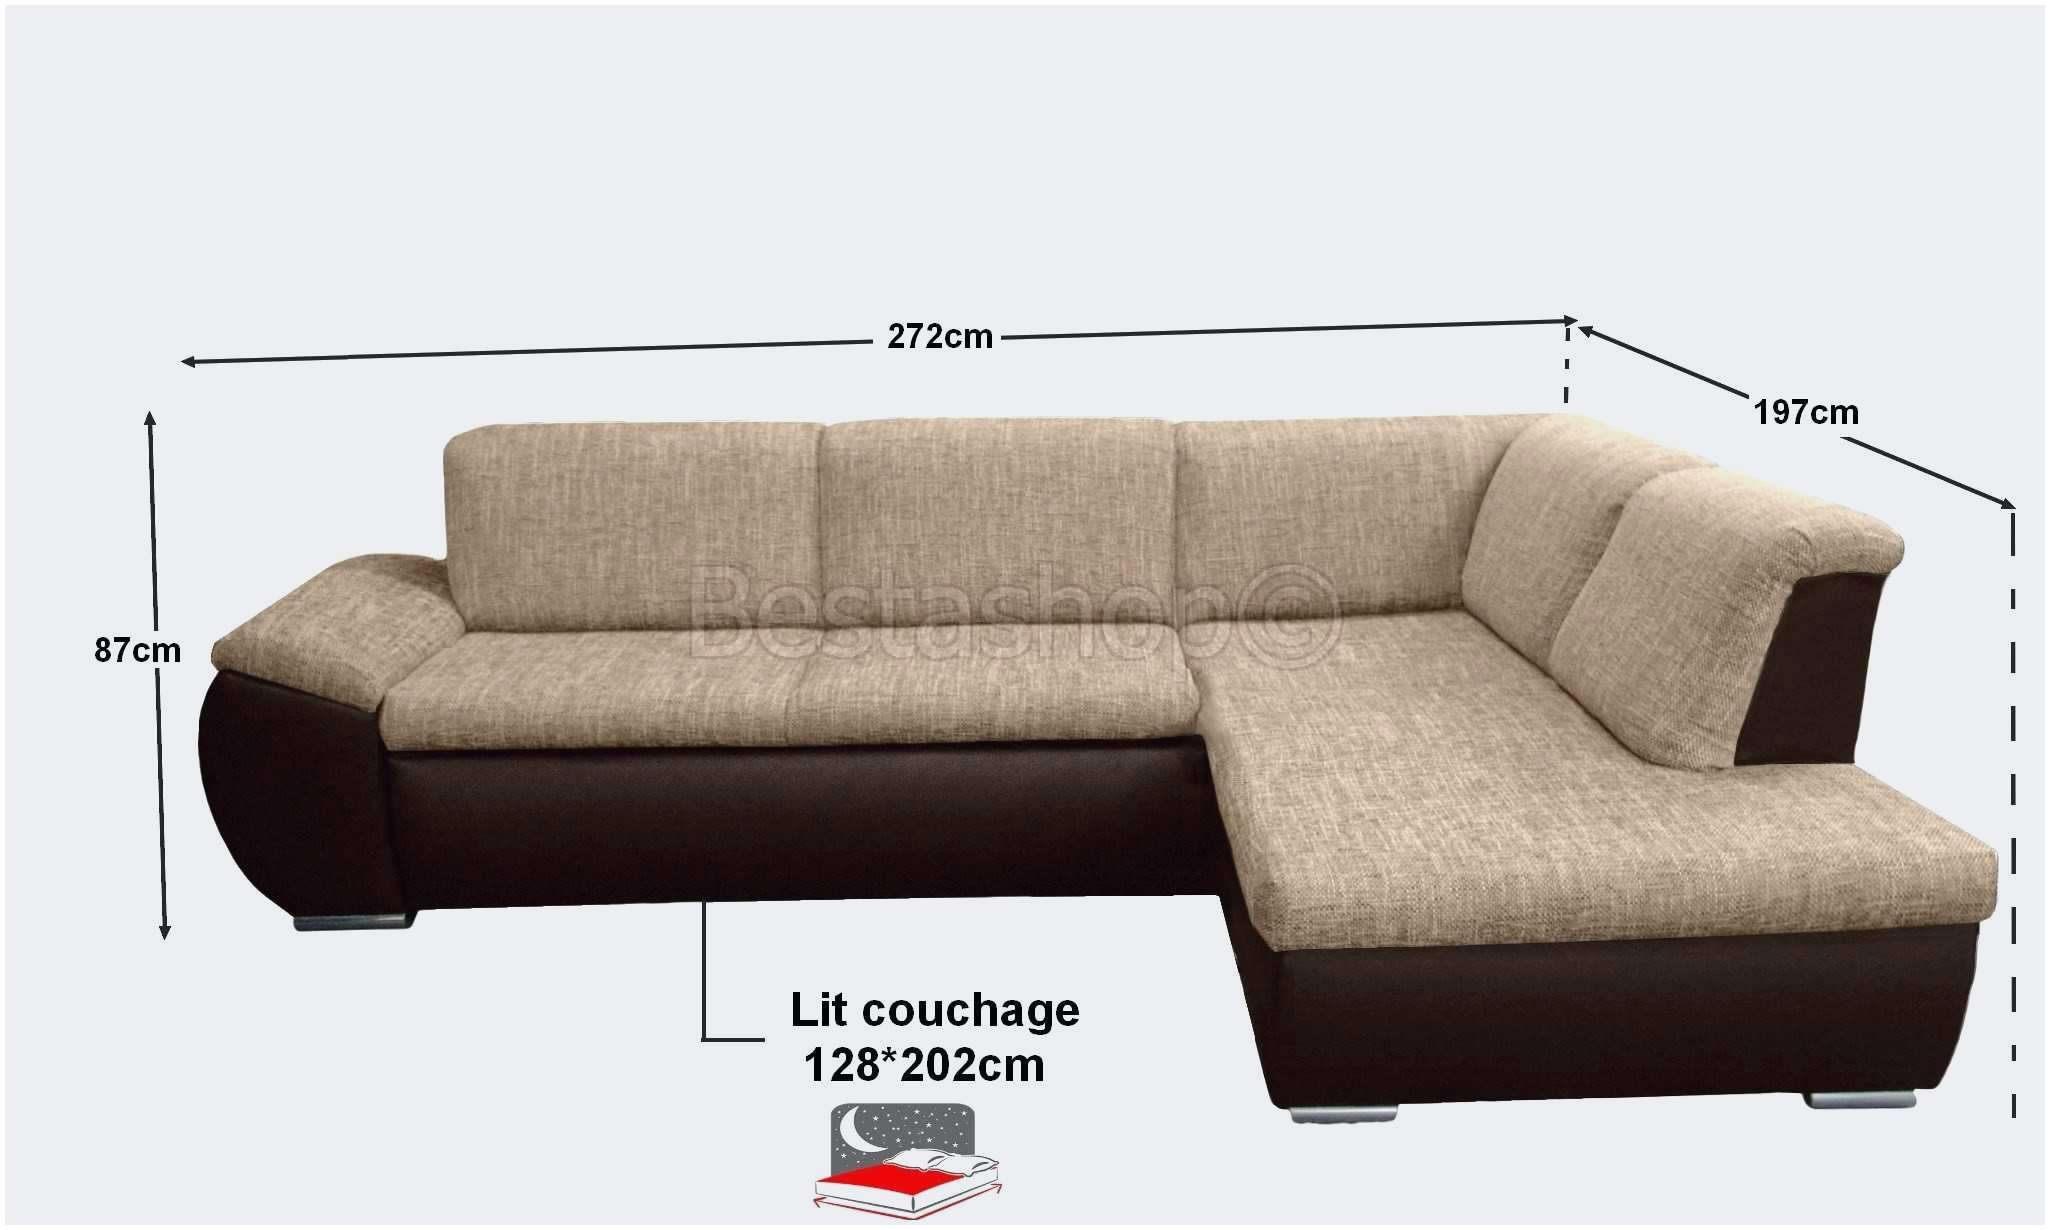 Canapé Lit Gris Agréable Elégant Canapé Angle Habitat Luxe S Canap Simili Cuir Marron 27 C3